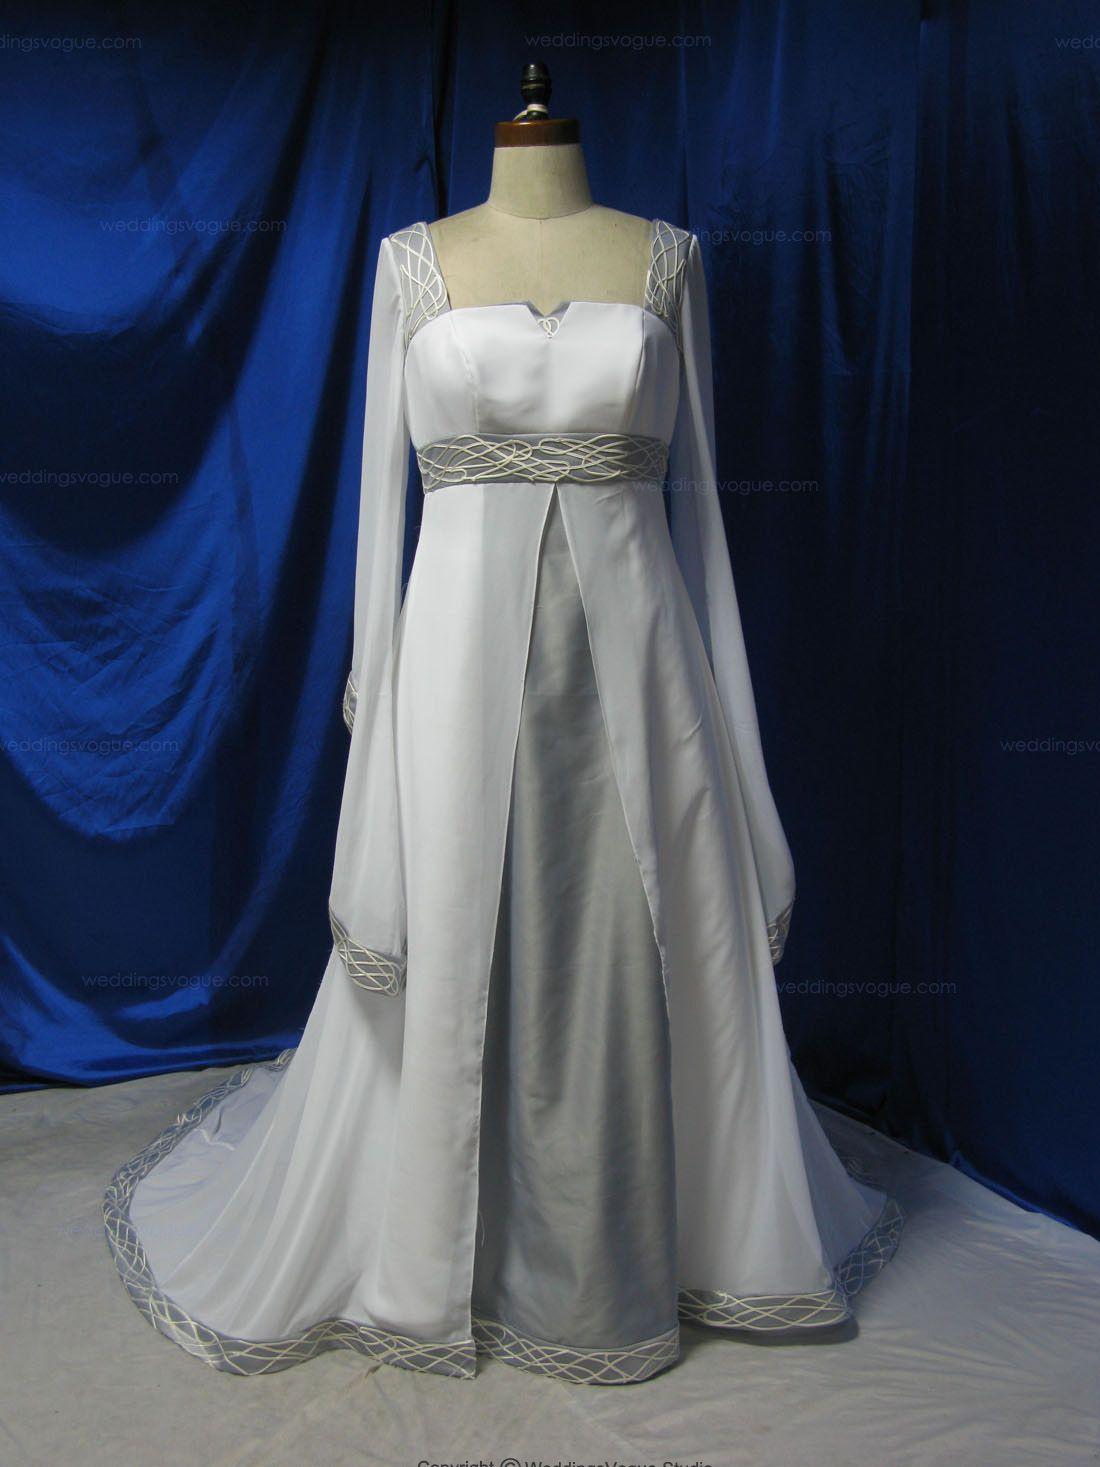 Plus size wedding dress designers  Comfortable Column Long Sleeves Crossed Ribbon Decorated Sweep Train